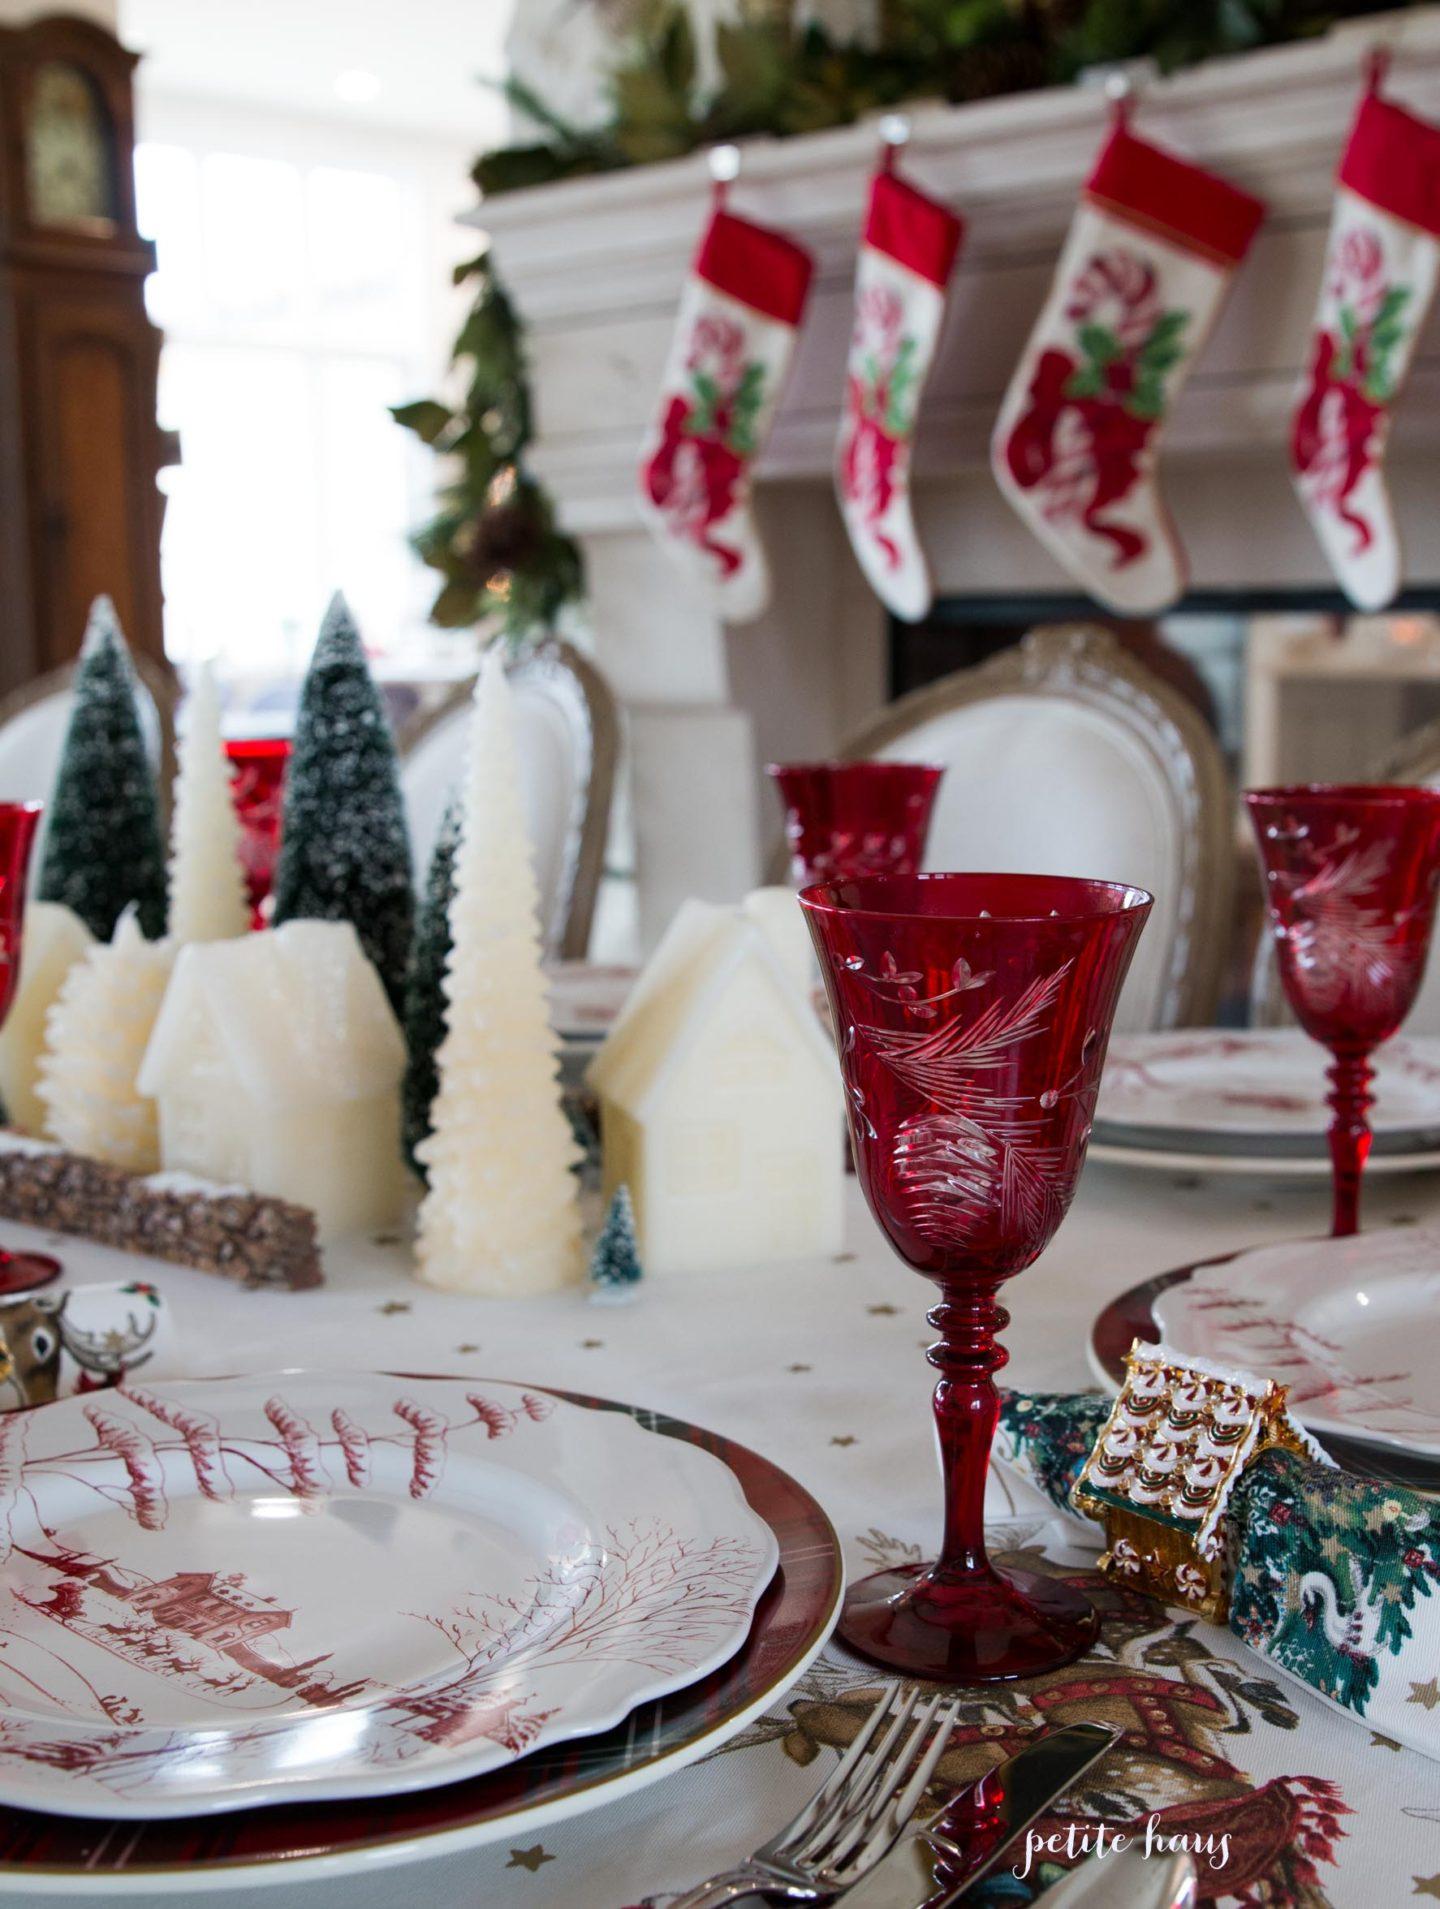 Williams Sonoma Christmas Table.Traditional Christmas Table Setting Petite Haus